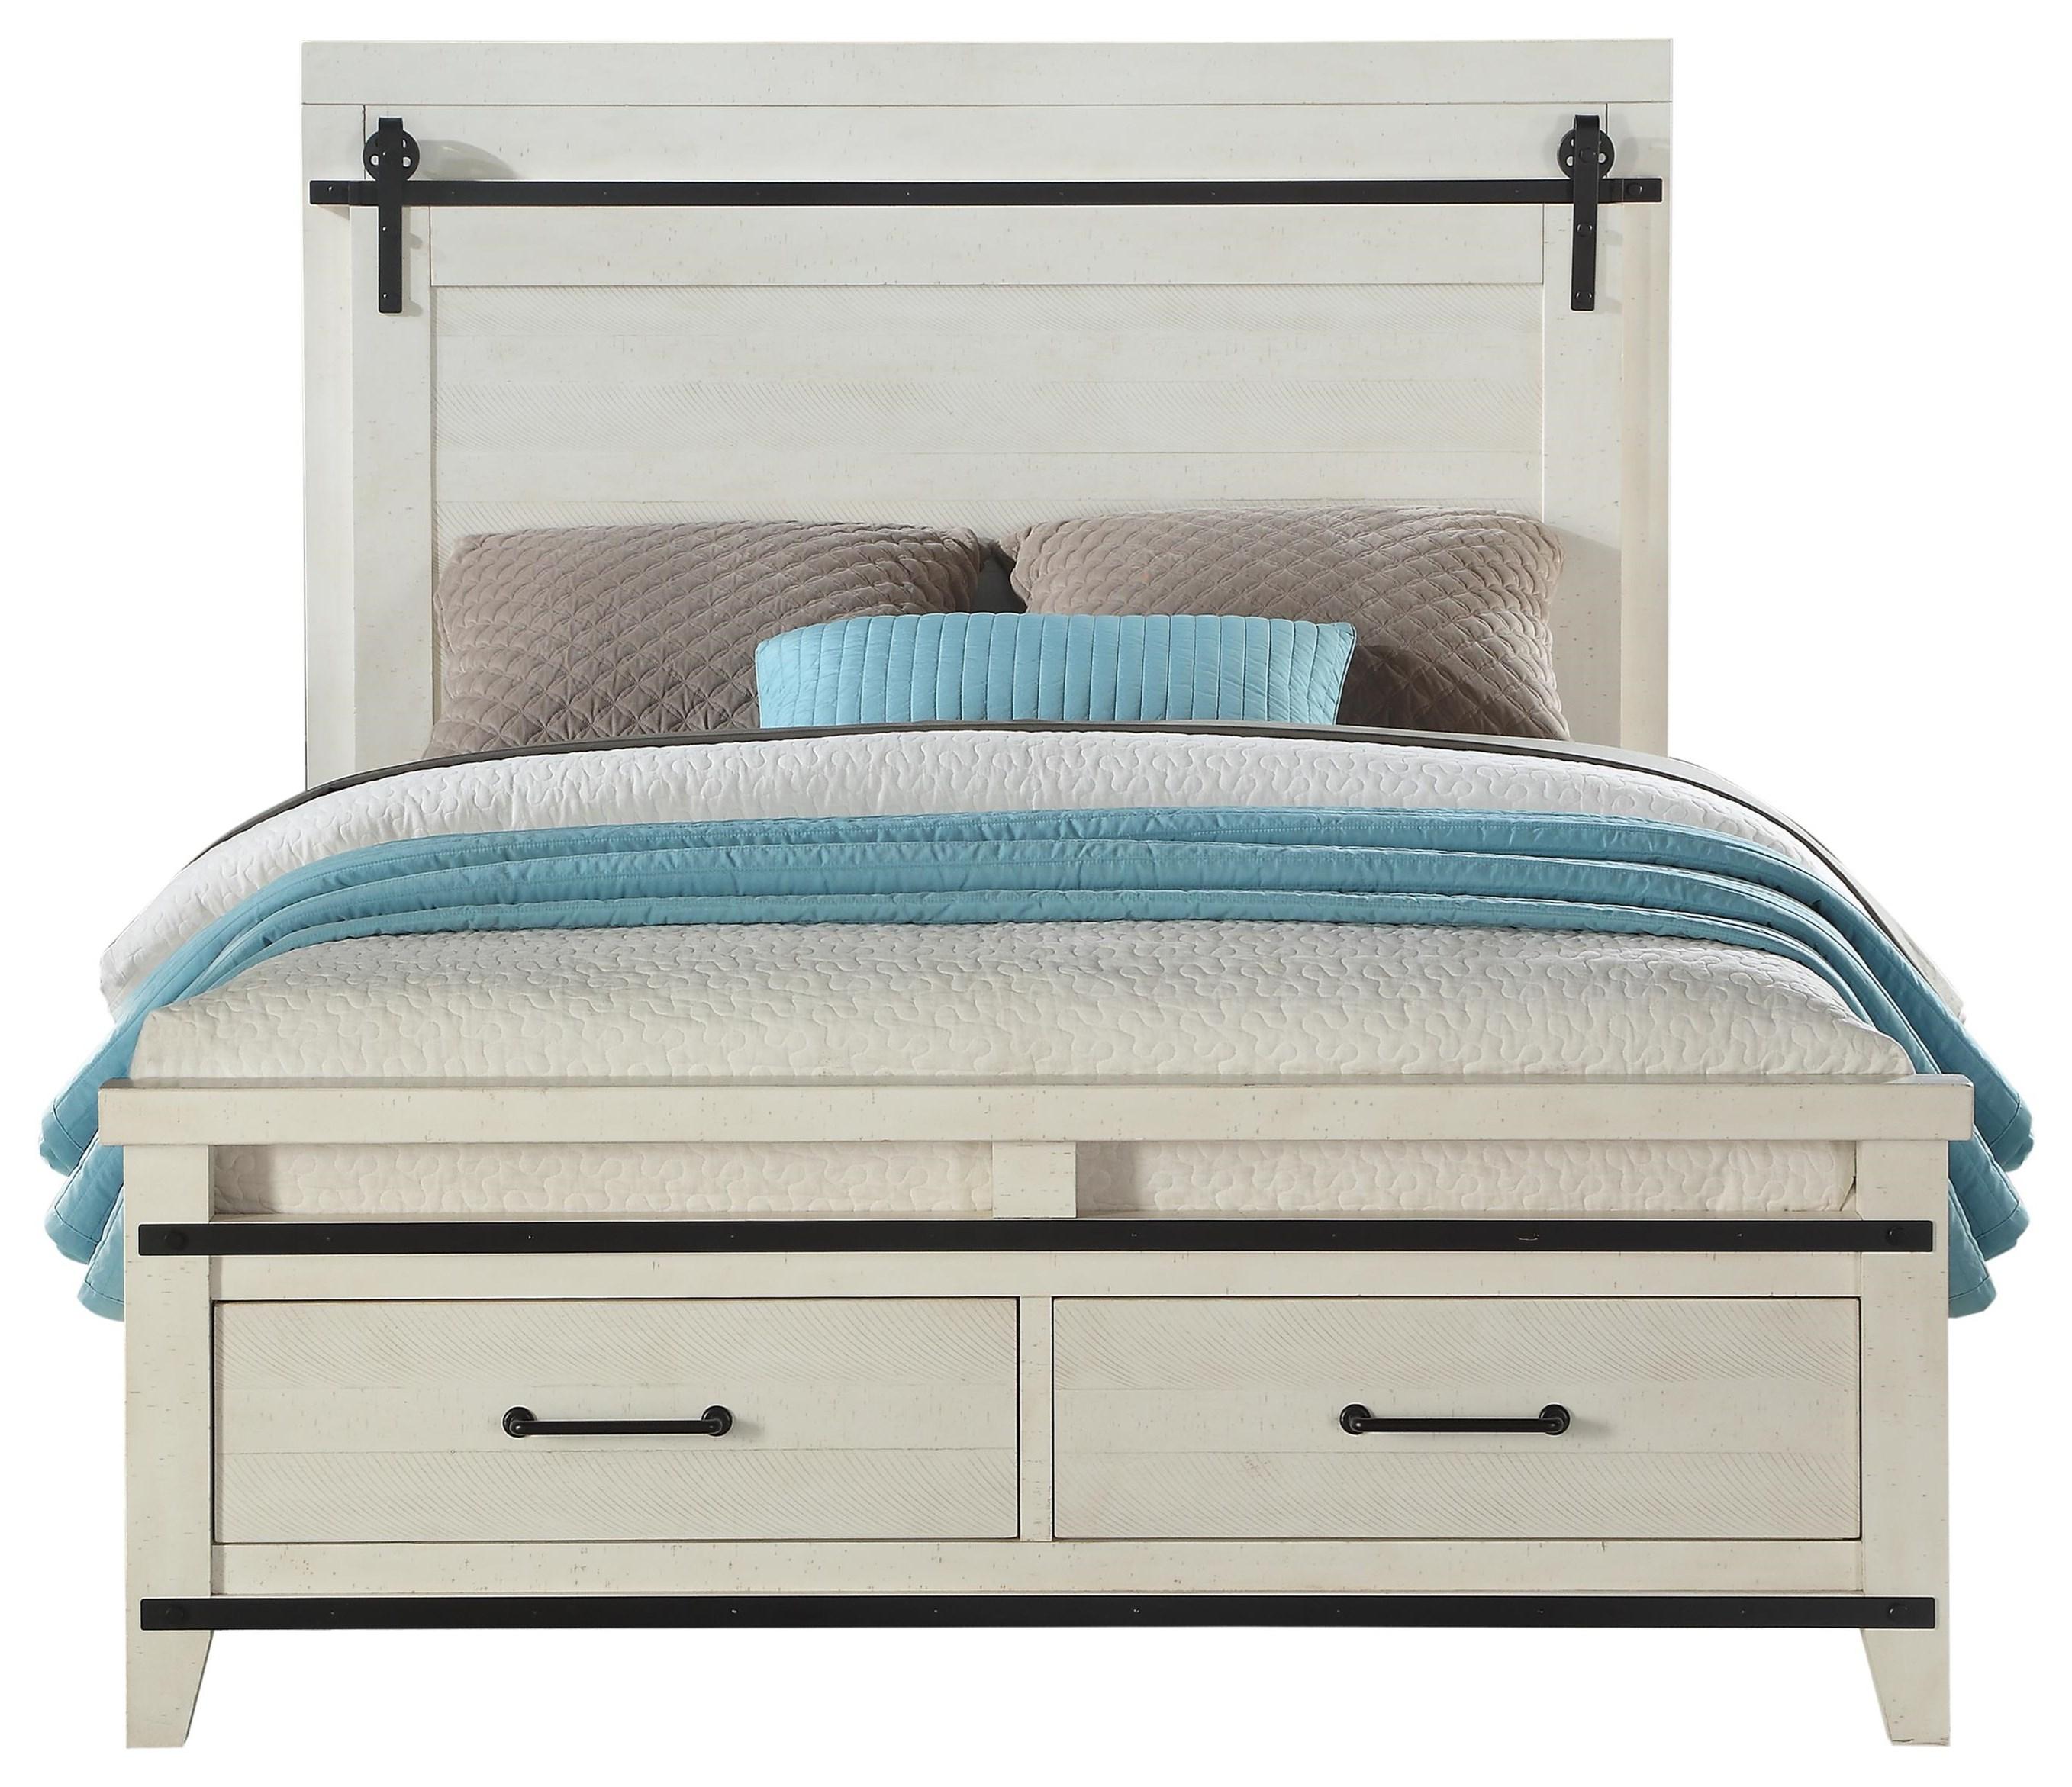 Dakota King Size Storage Bed by HH at Walker's Furniture